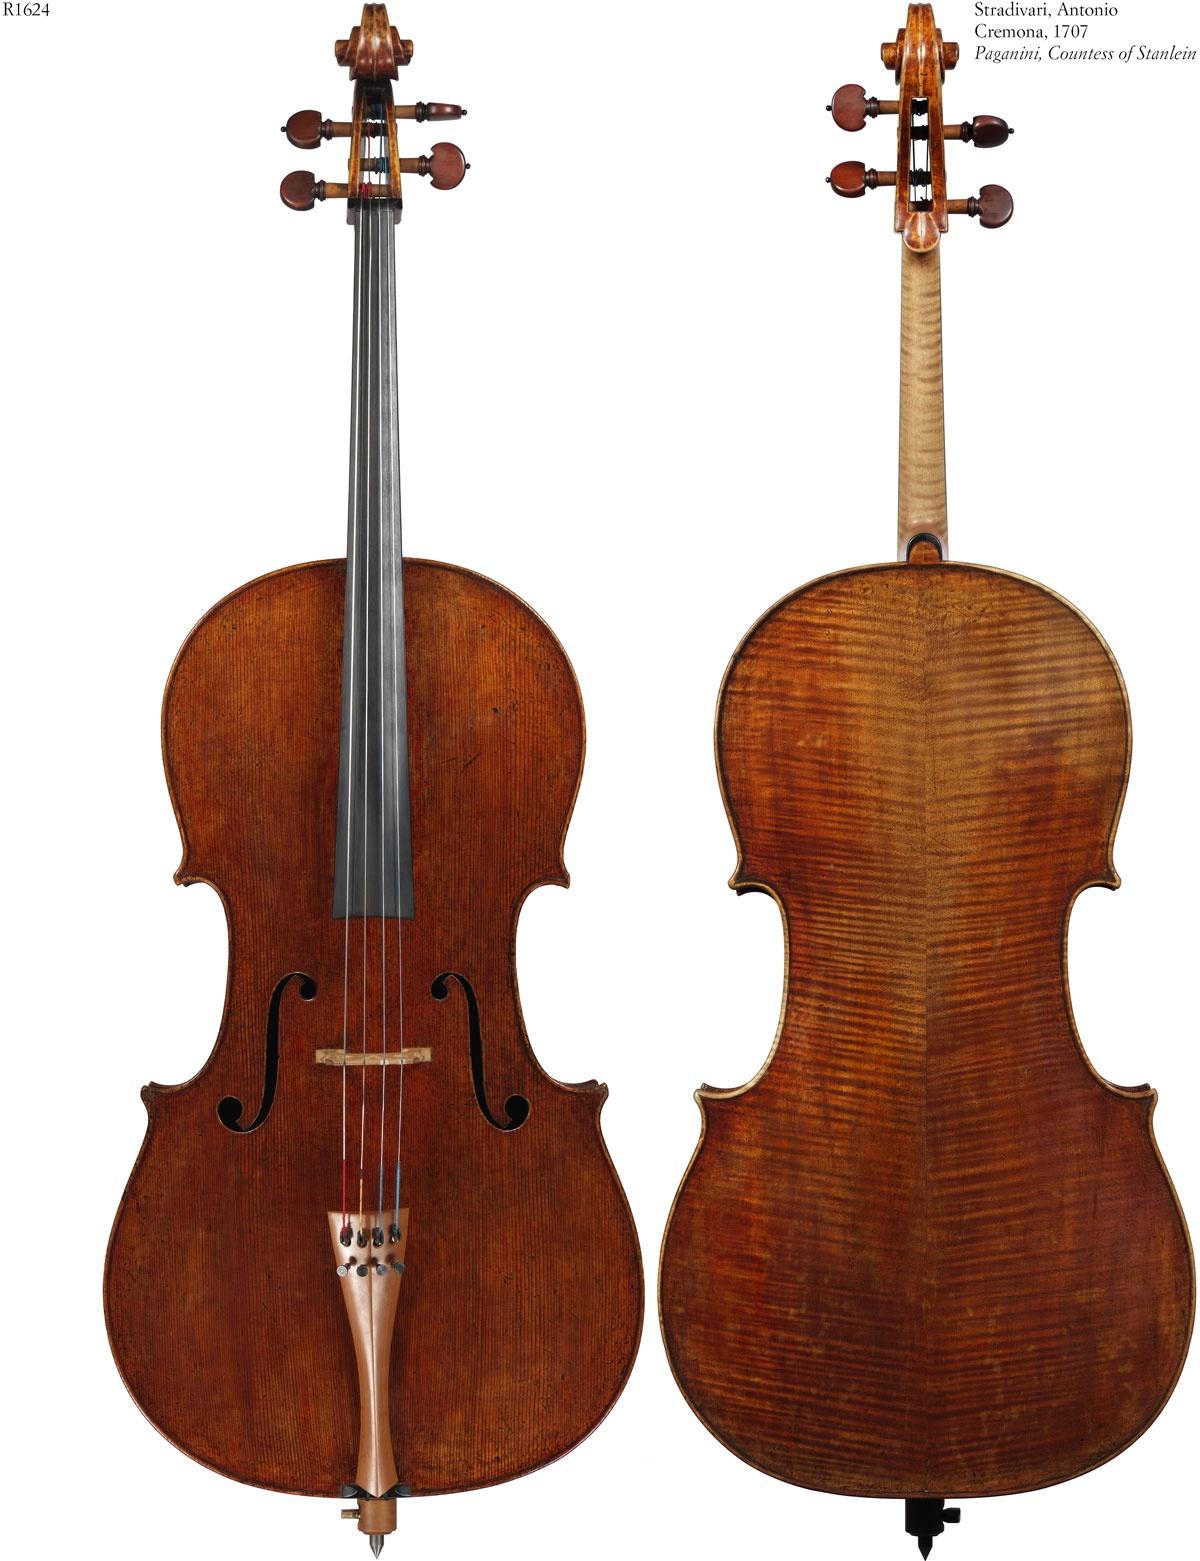 Stradivarius cello will be